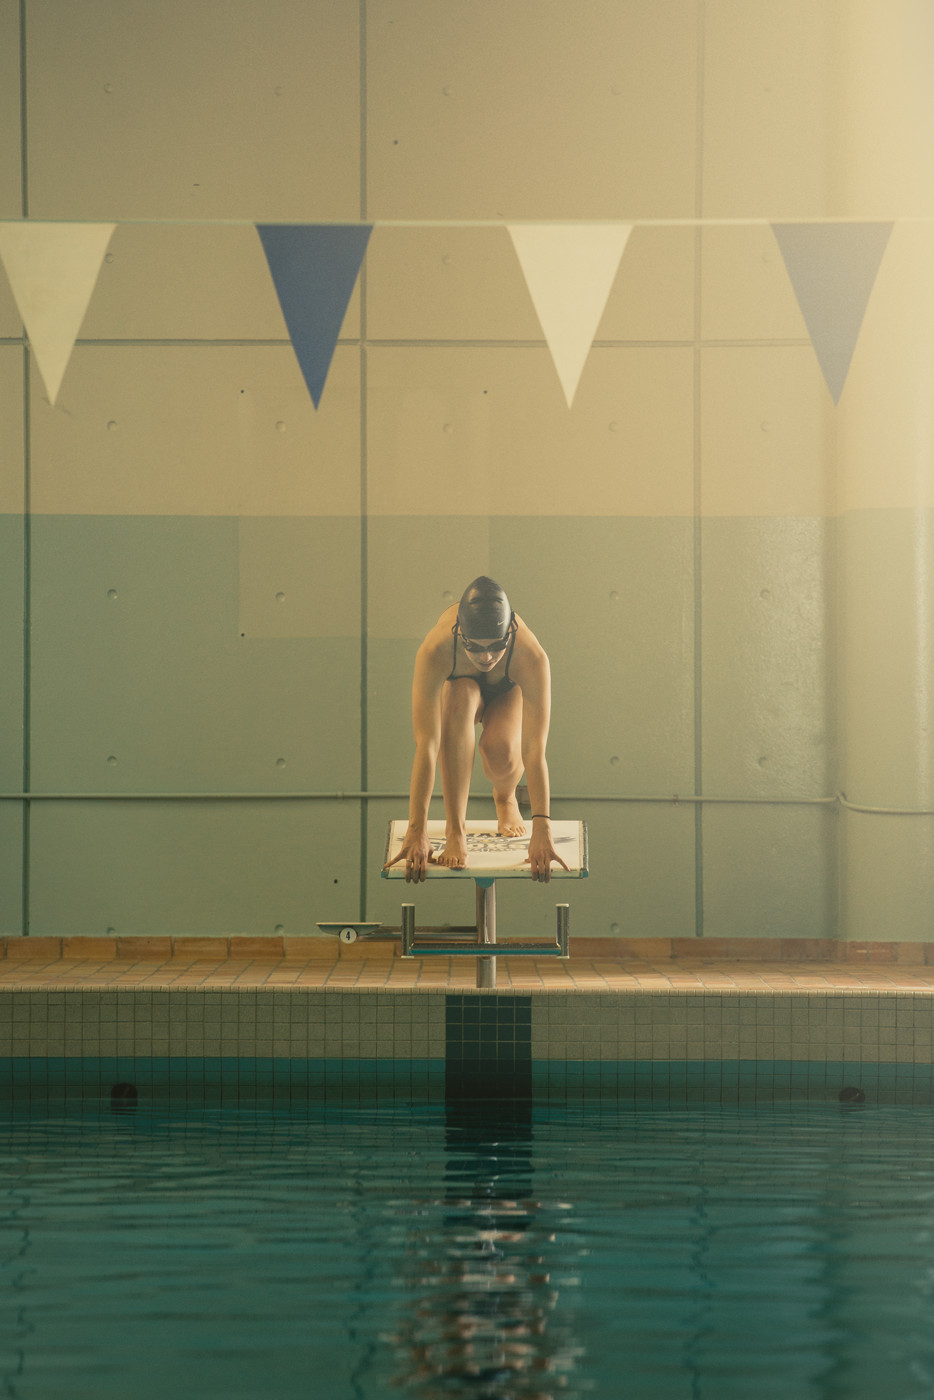 NAIT-Swimmer-Student-Athlete-Cinematic-Portrait_O6A8238-Edit-Full.jpg